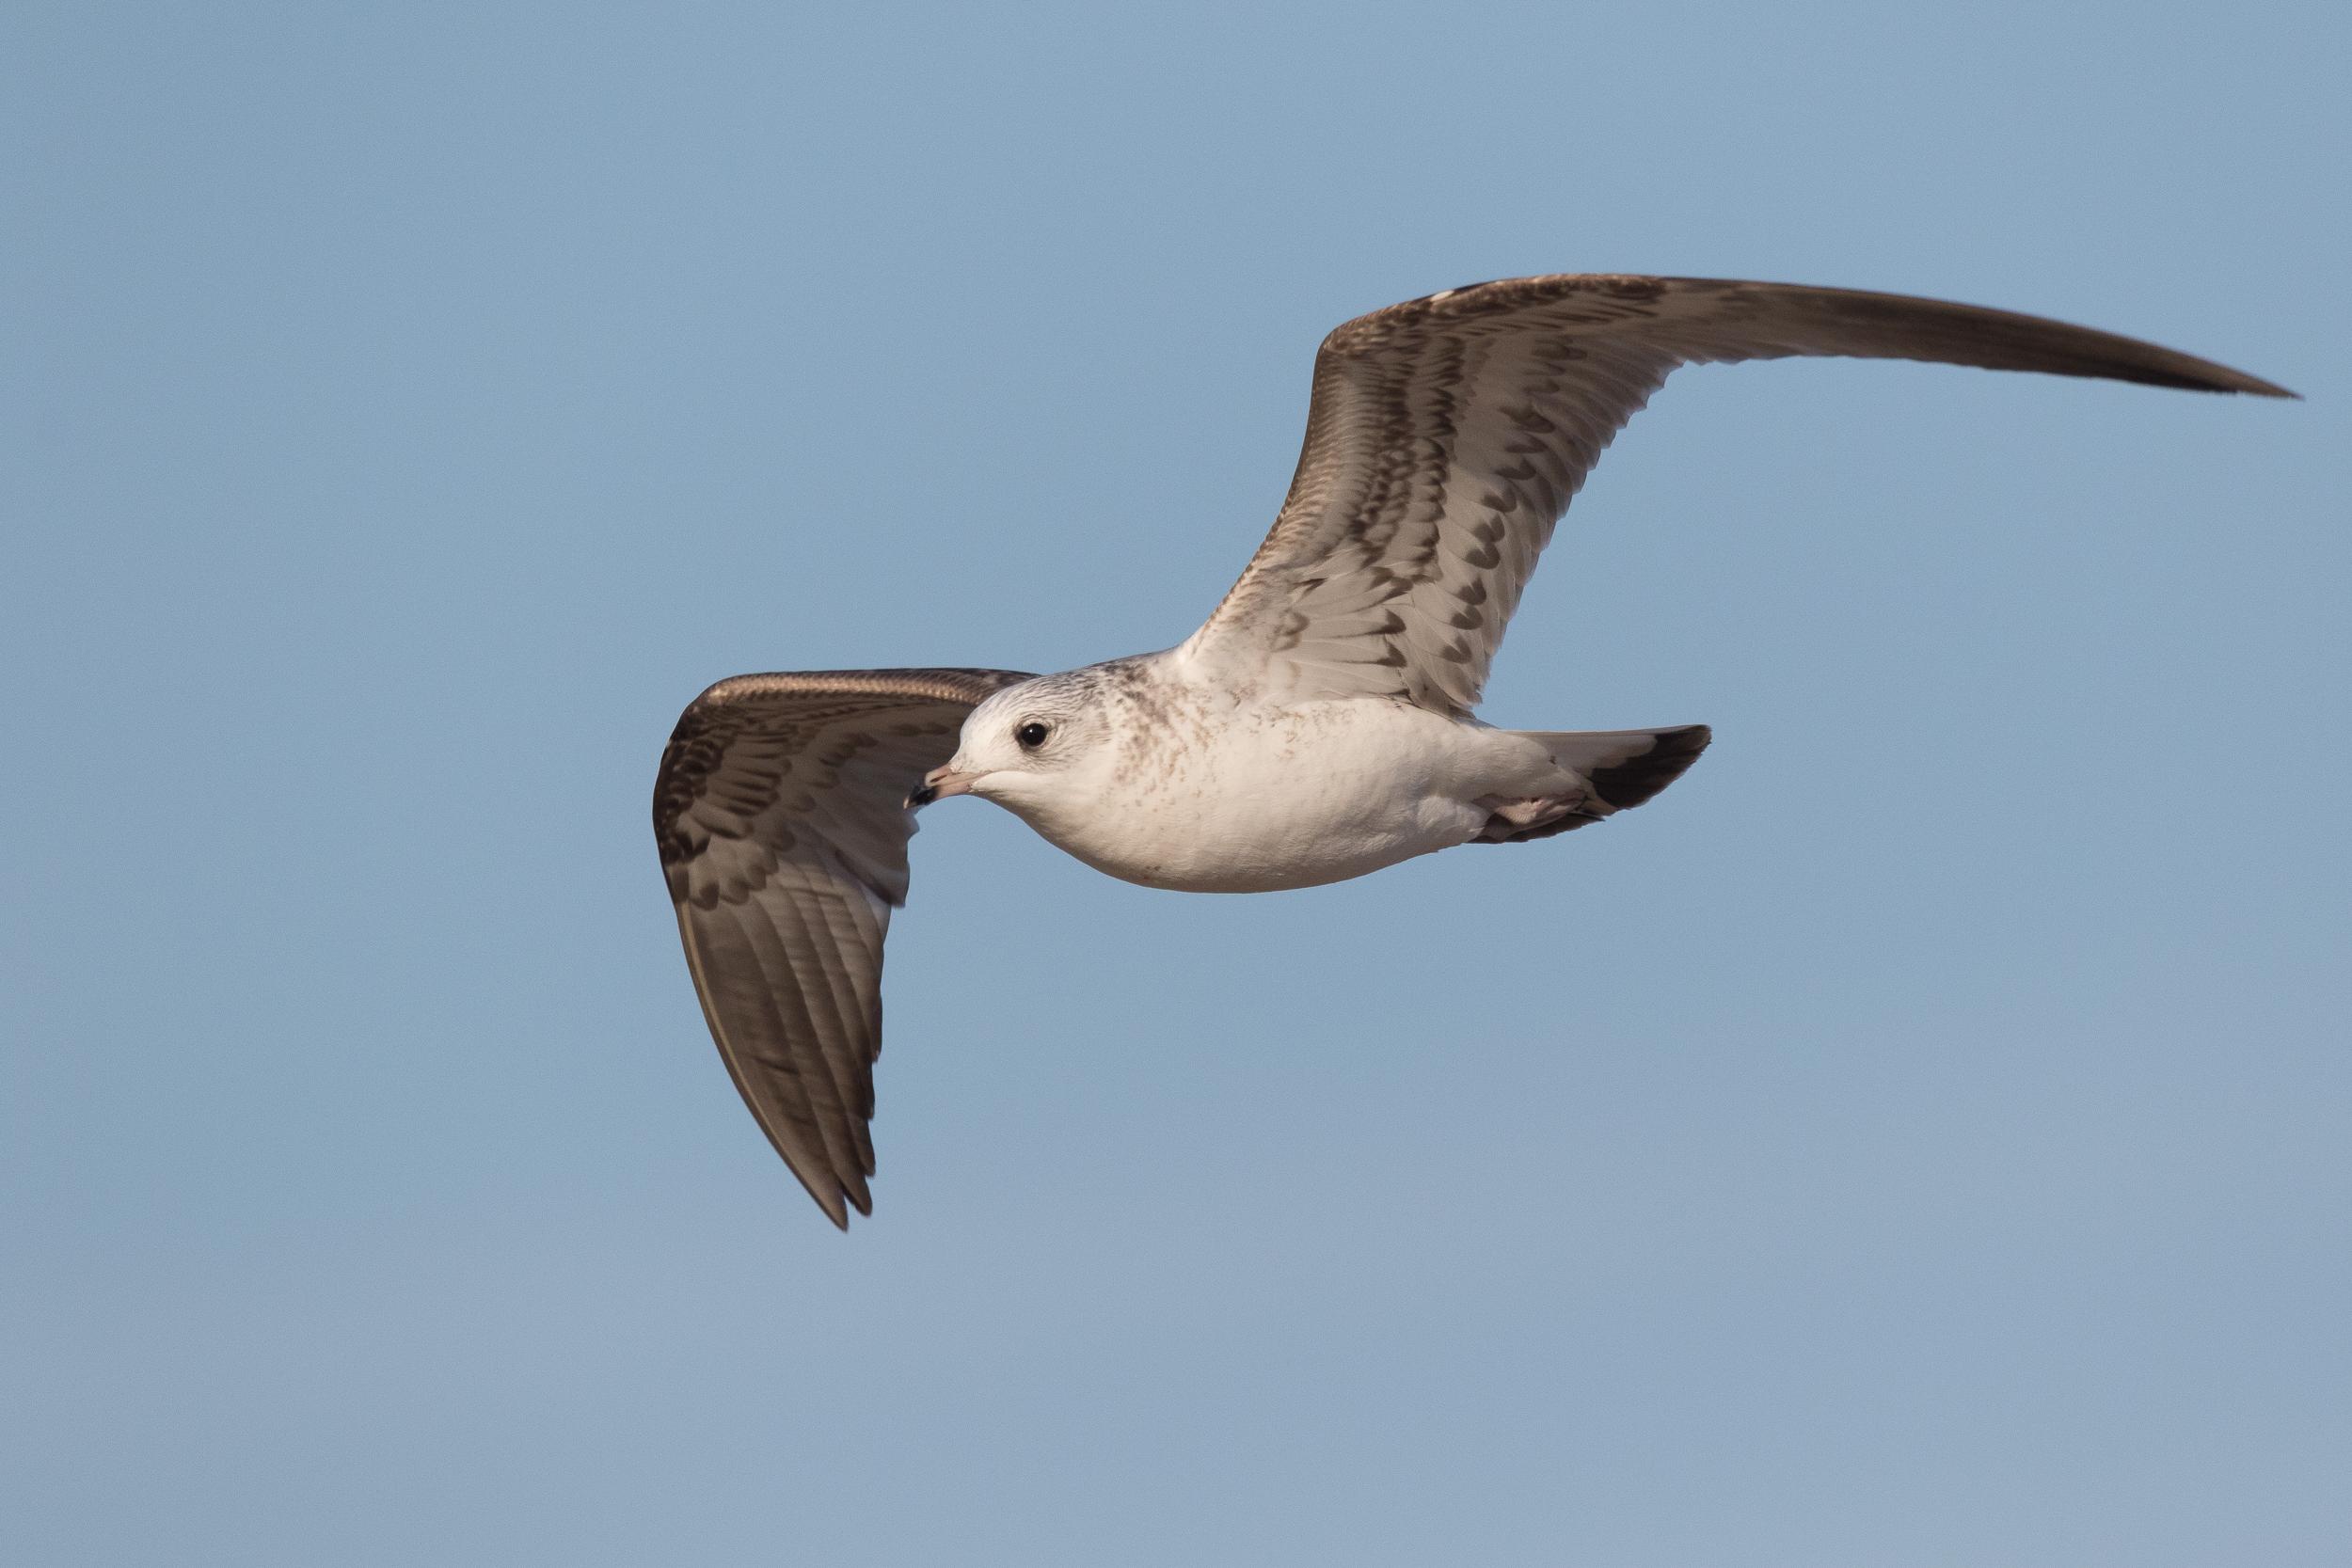 20170121-Common Gull 2CY-43.jpg